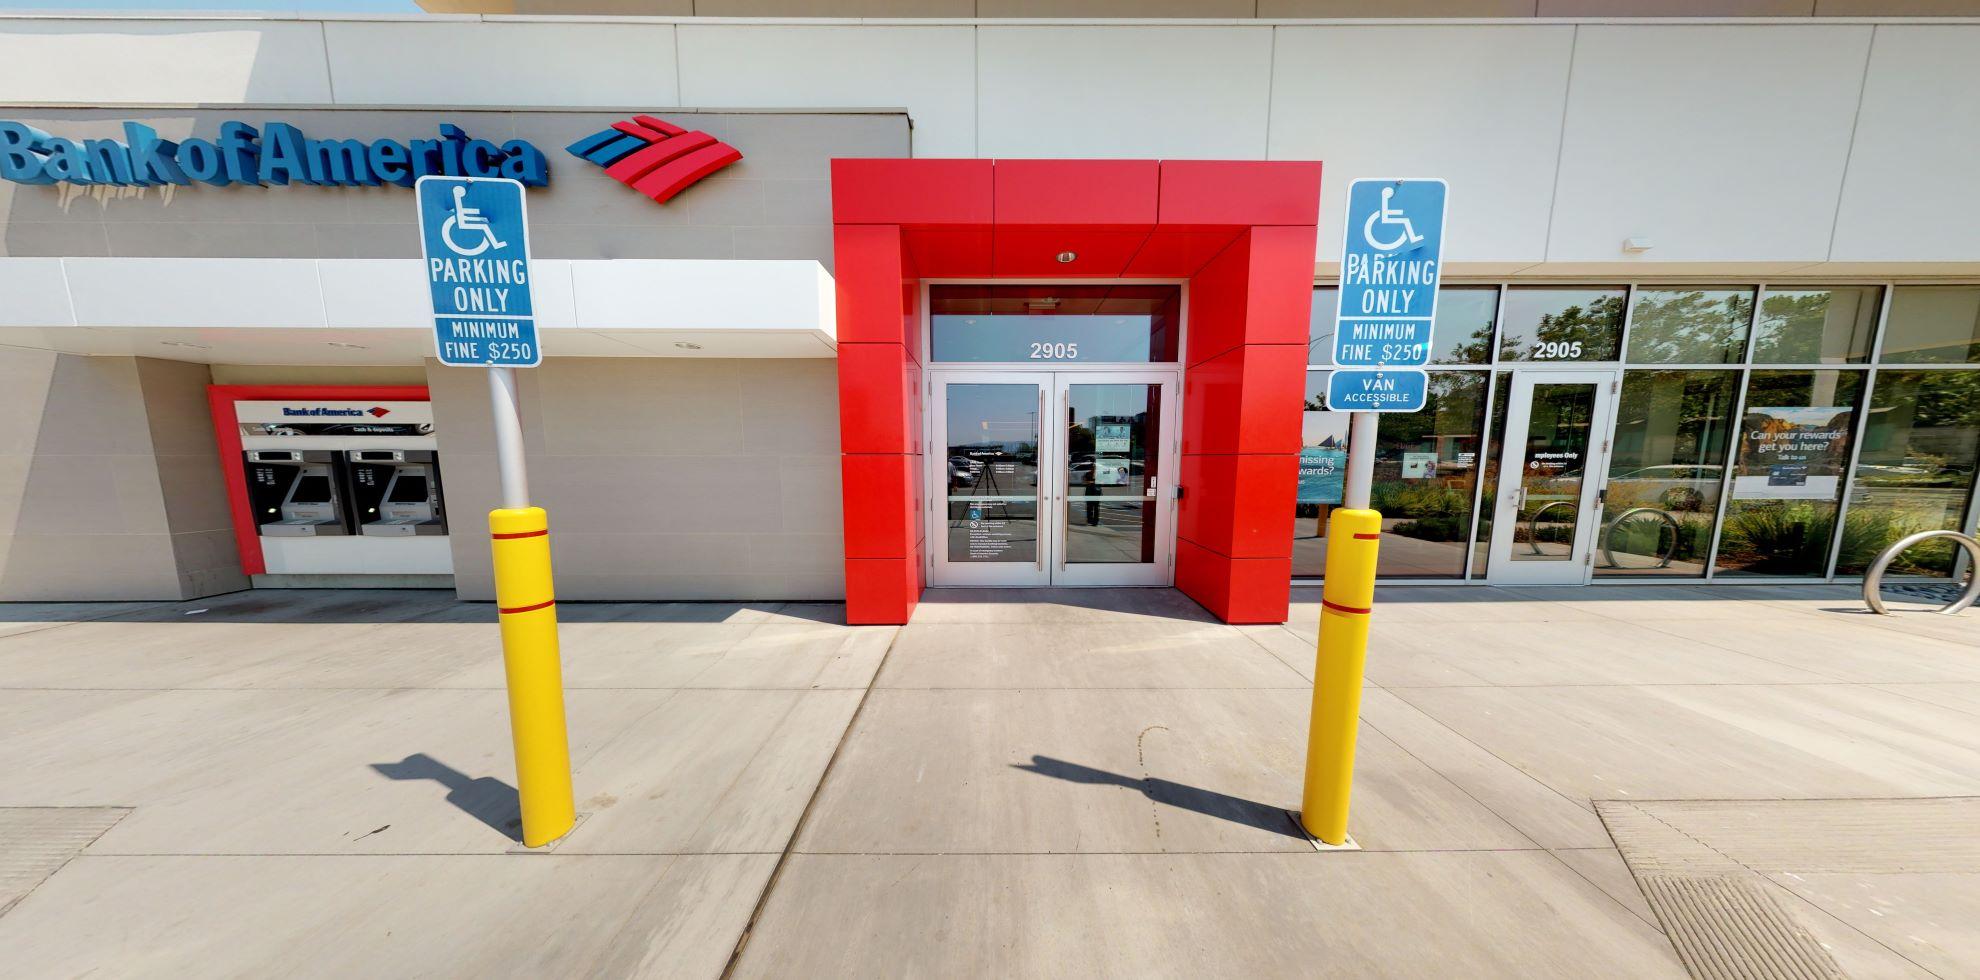 Bank of America financial center with walk-up ATM   2905 Stevens Creek Blvd, Santa Clara, CA 95050